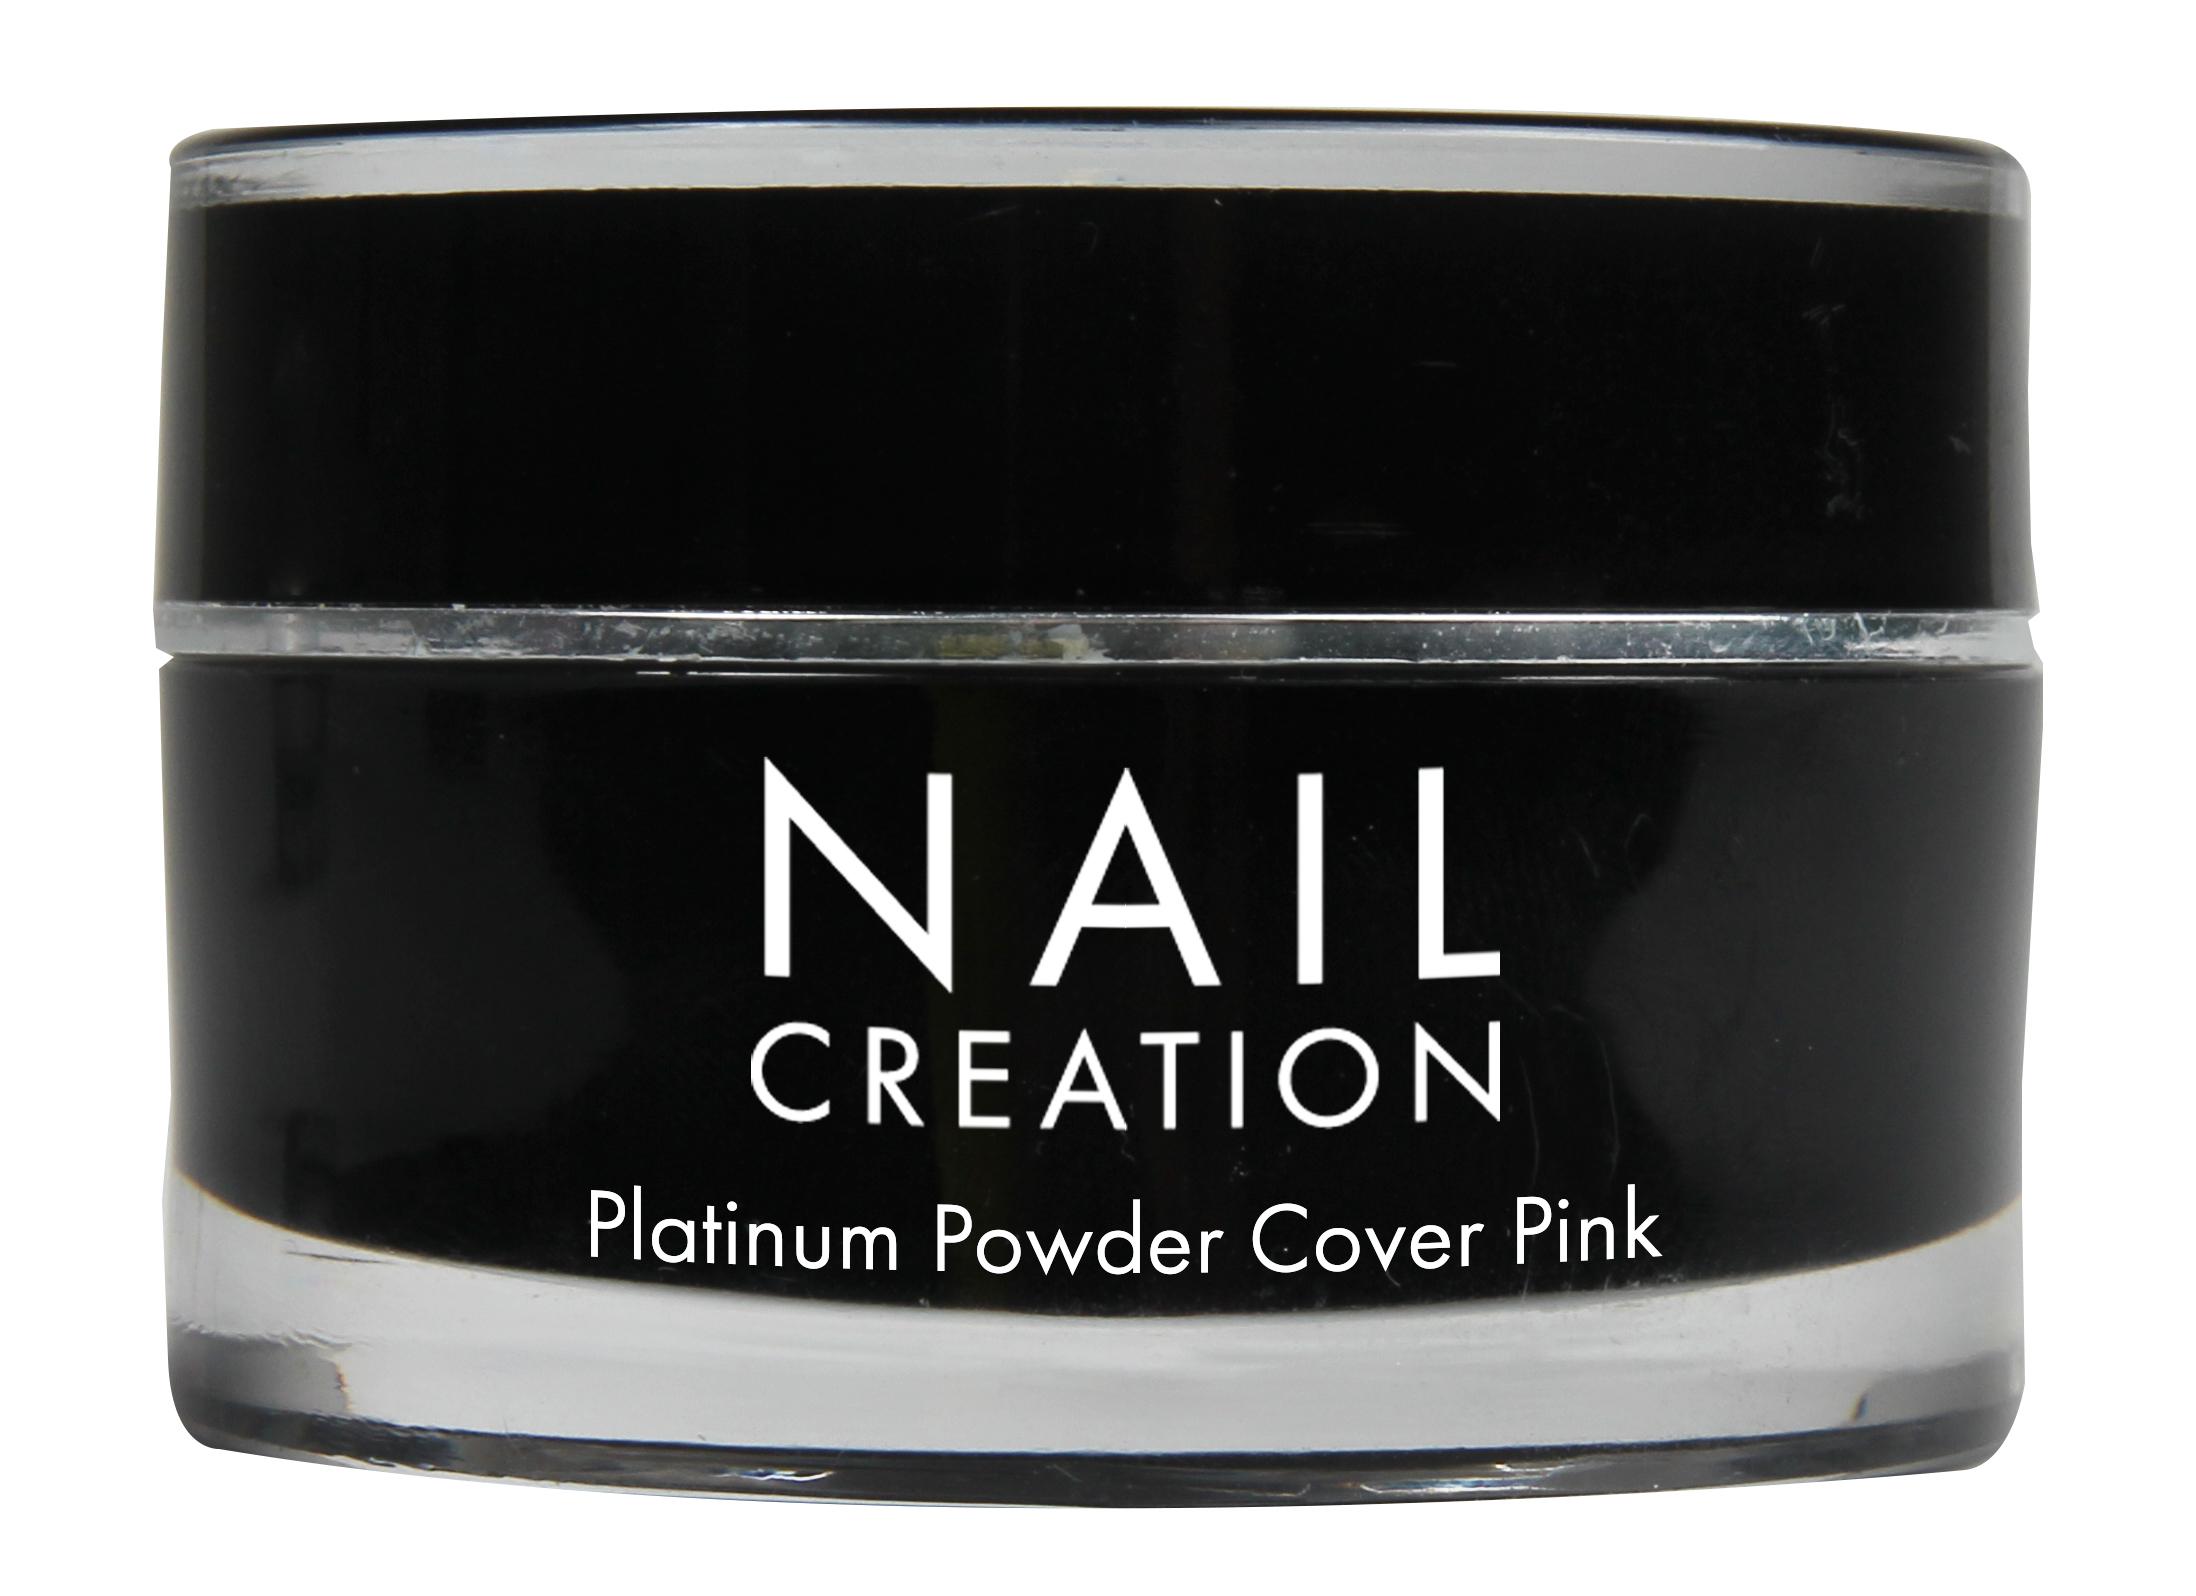 Afbeelding van Nail Creation Platinum Powder - Cover Pink